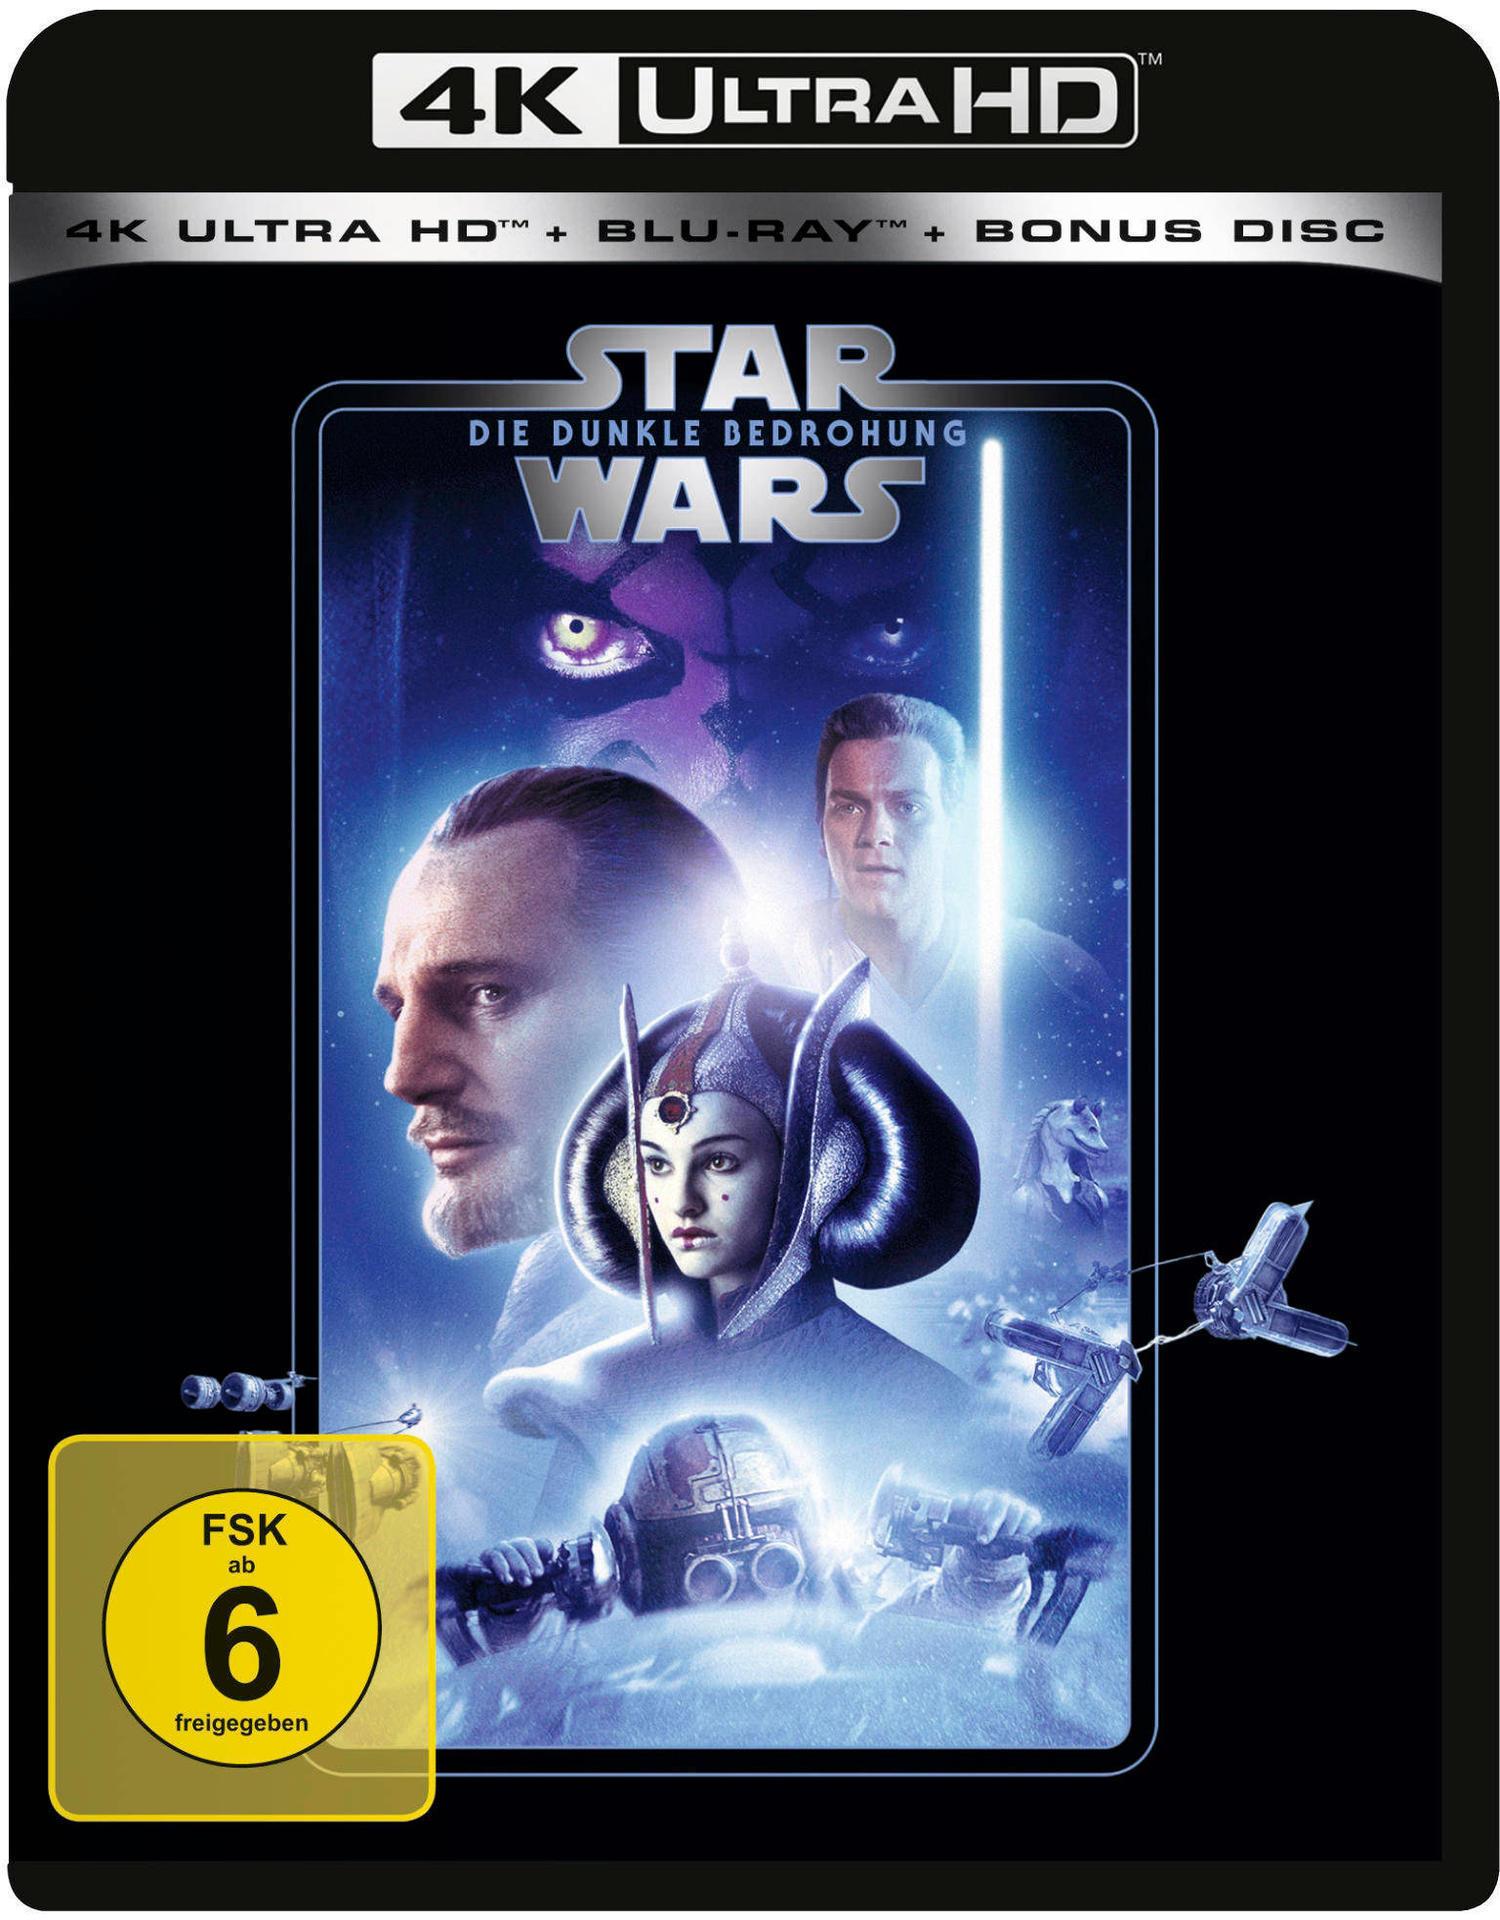 Star Wars: Episode I - Die dunkle Bedrohung (4K Ultra HD BLU-RAY + BLU-RAY) für 33,96 Euro